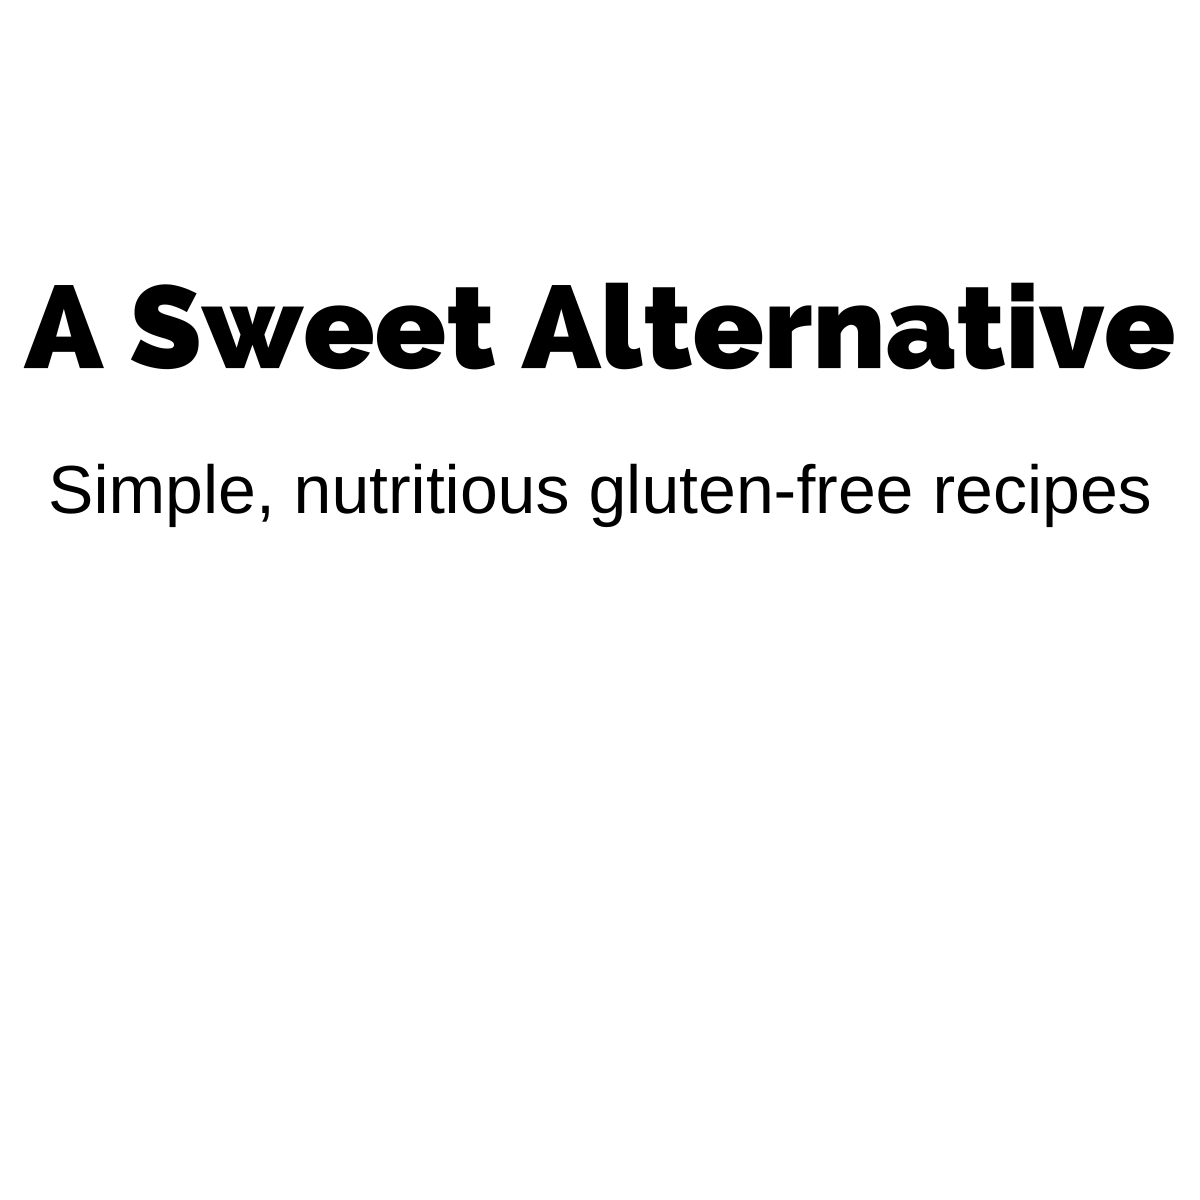 A Sweet Alternative